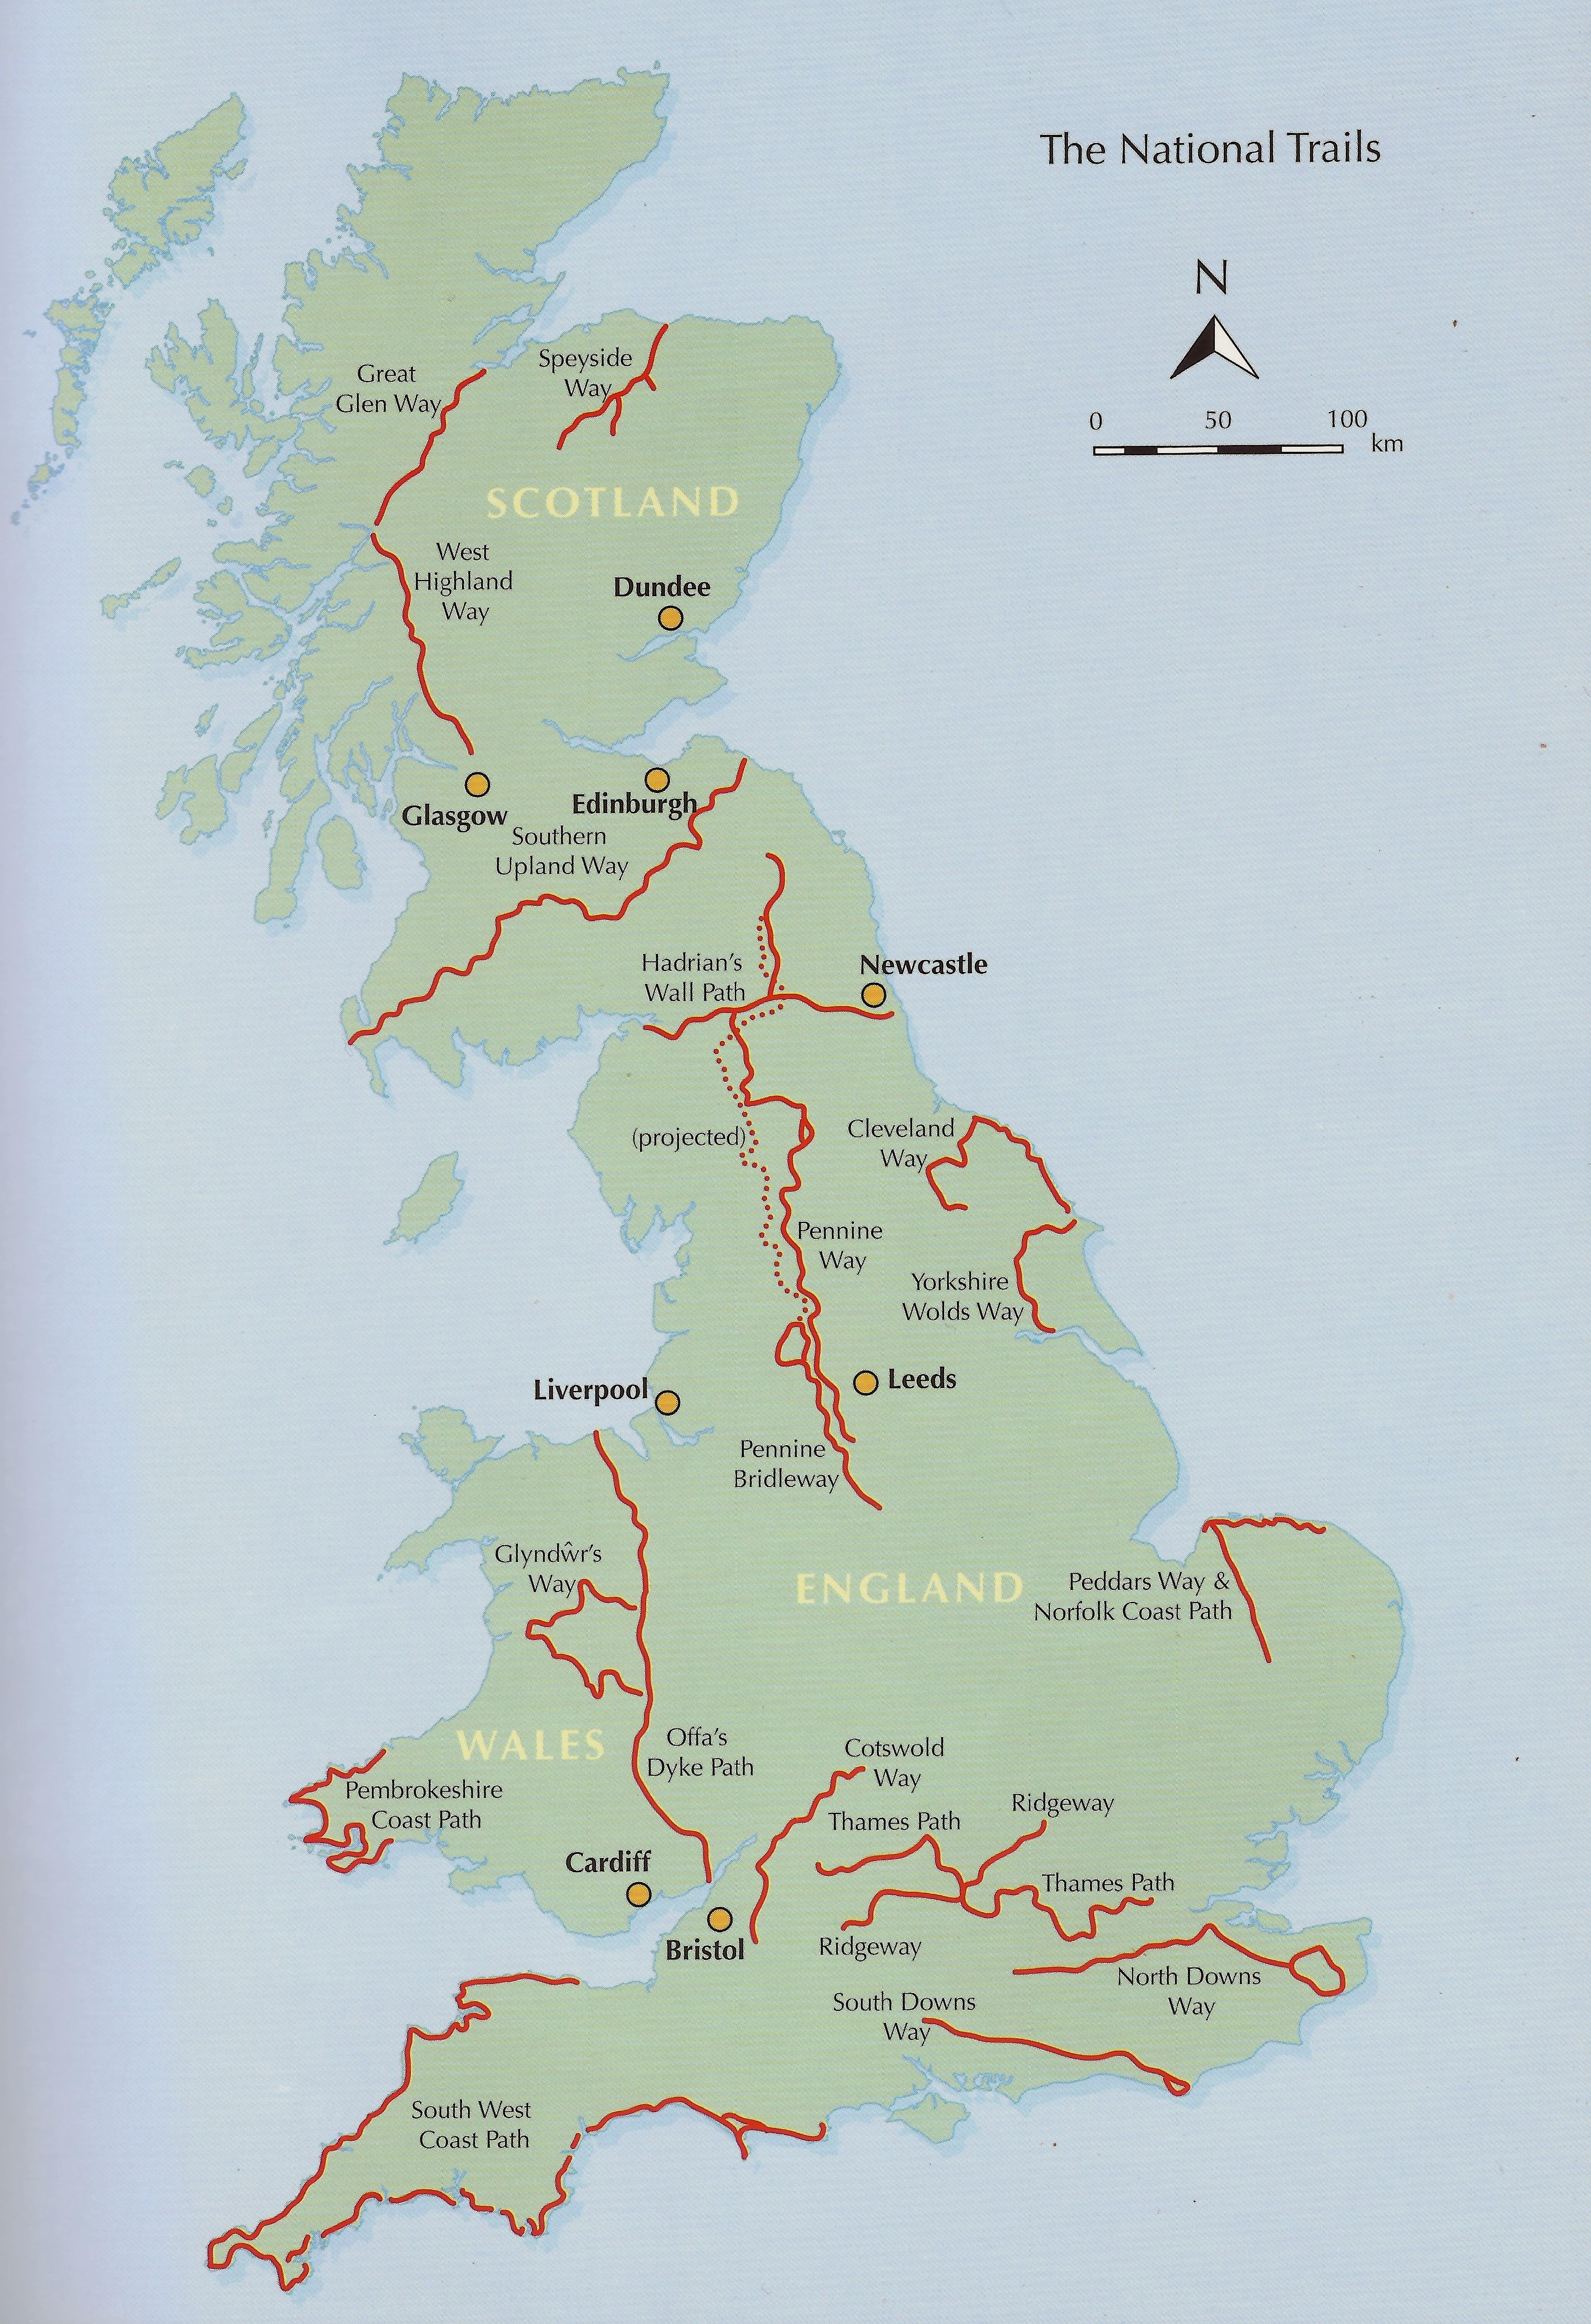 National Trails